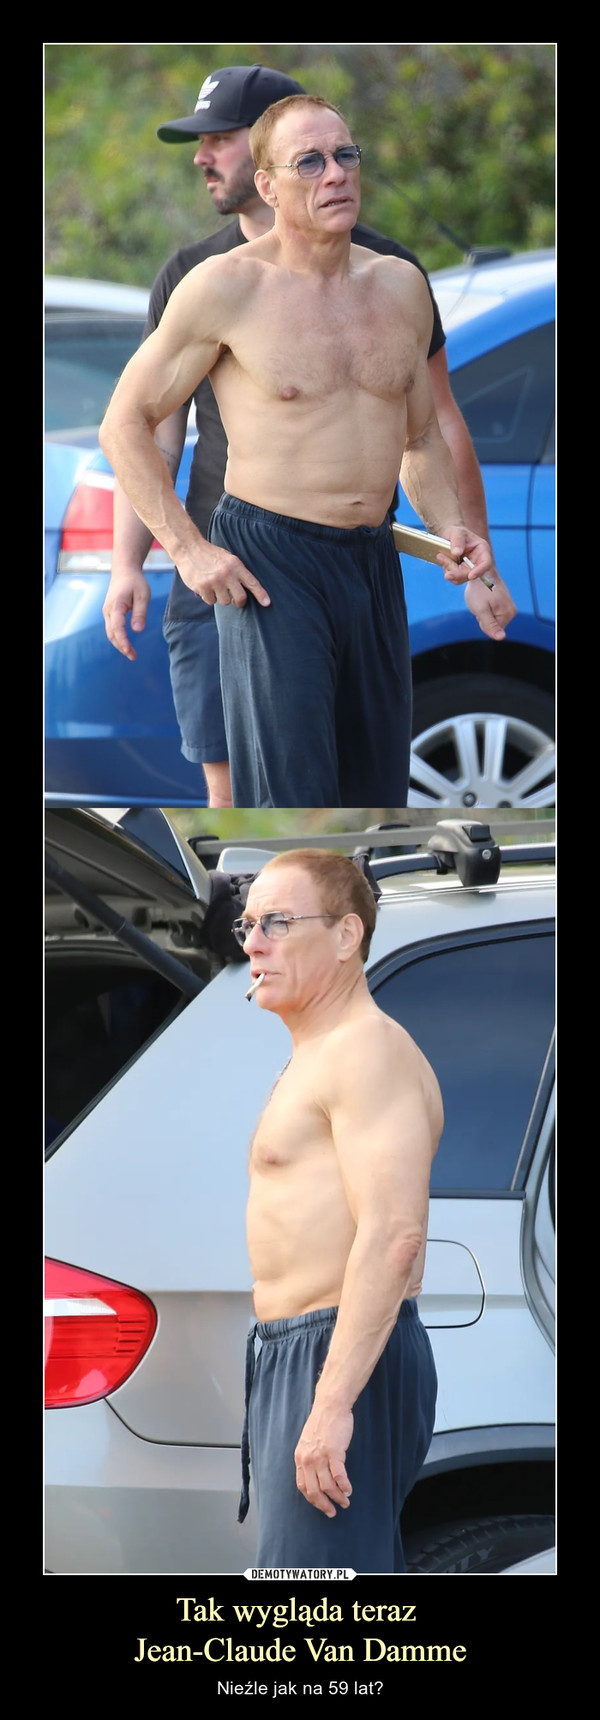 Tak wygląda teraz Jean-Claude Van Damme – Nieźle jak na 59 lat?